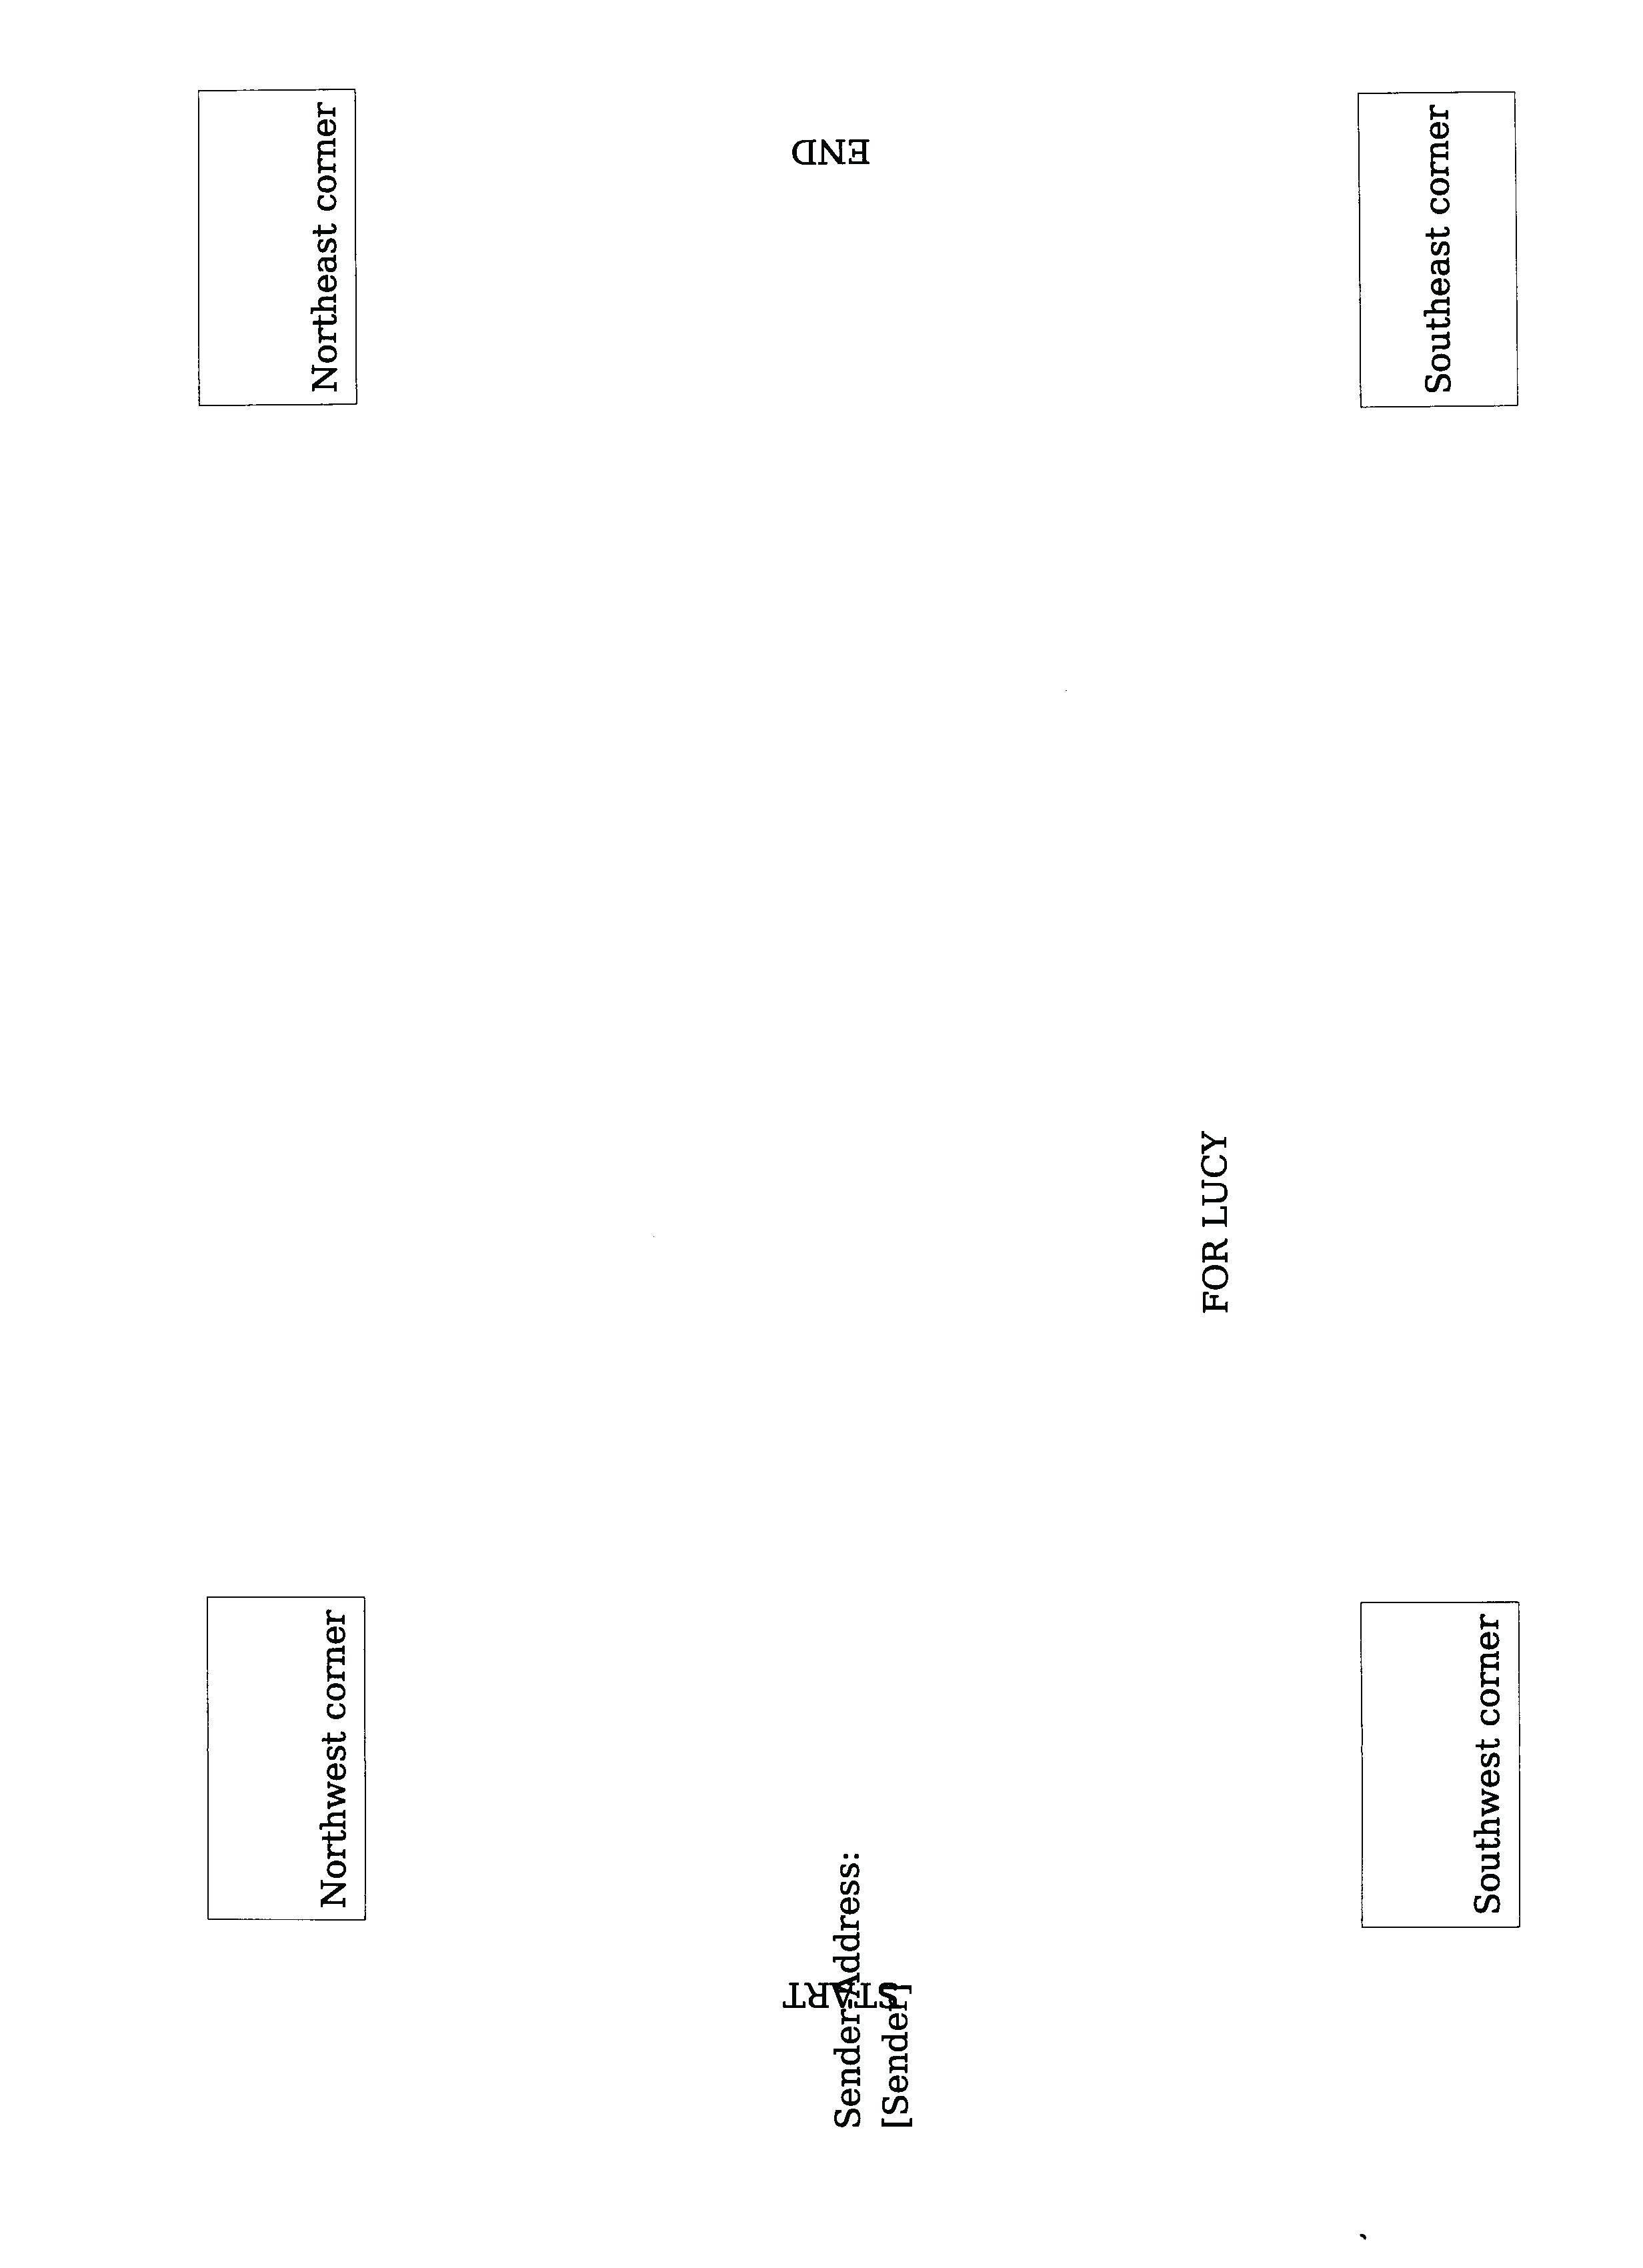 Templates For A7 Envelopes